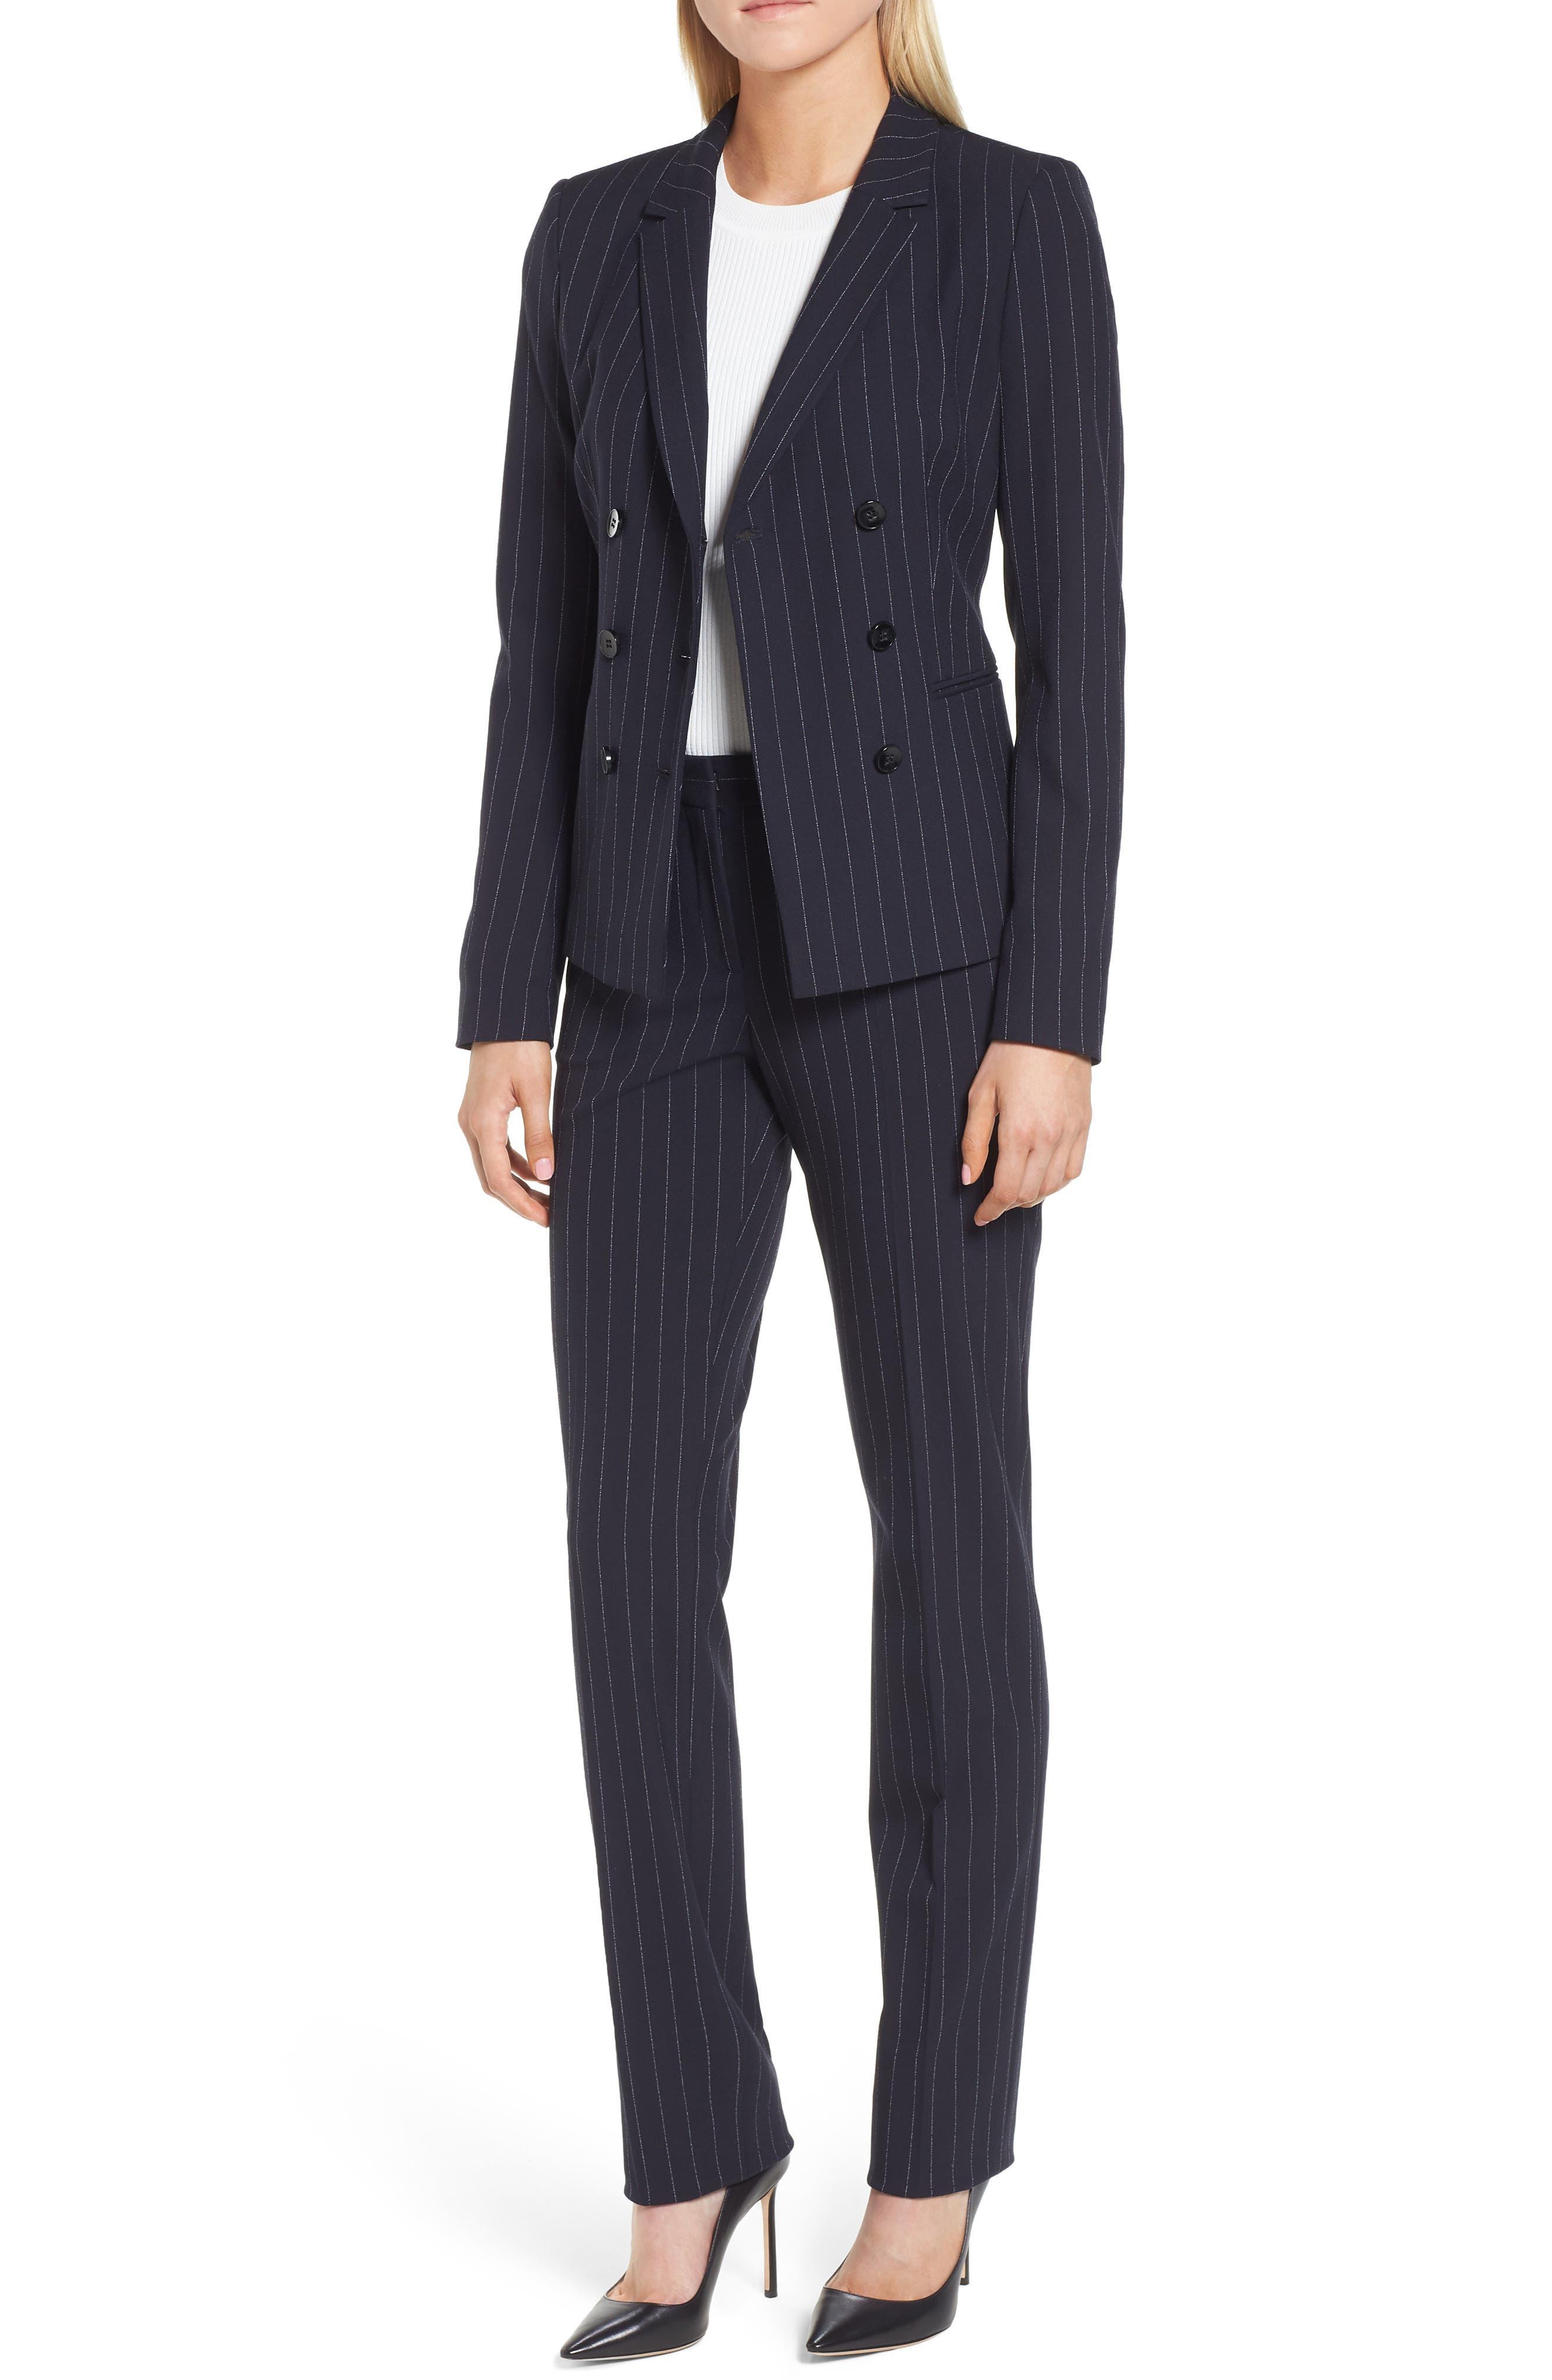 Titana Pinstripe Suit Trousers,                             Alternate thumbnail 2, color,                             Navy Fantasy